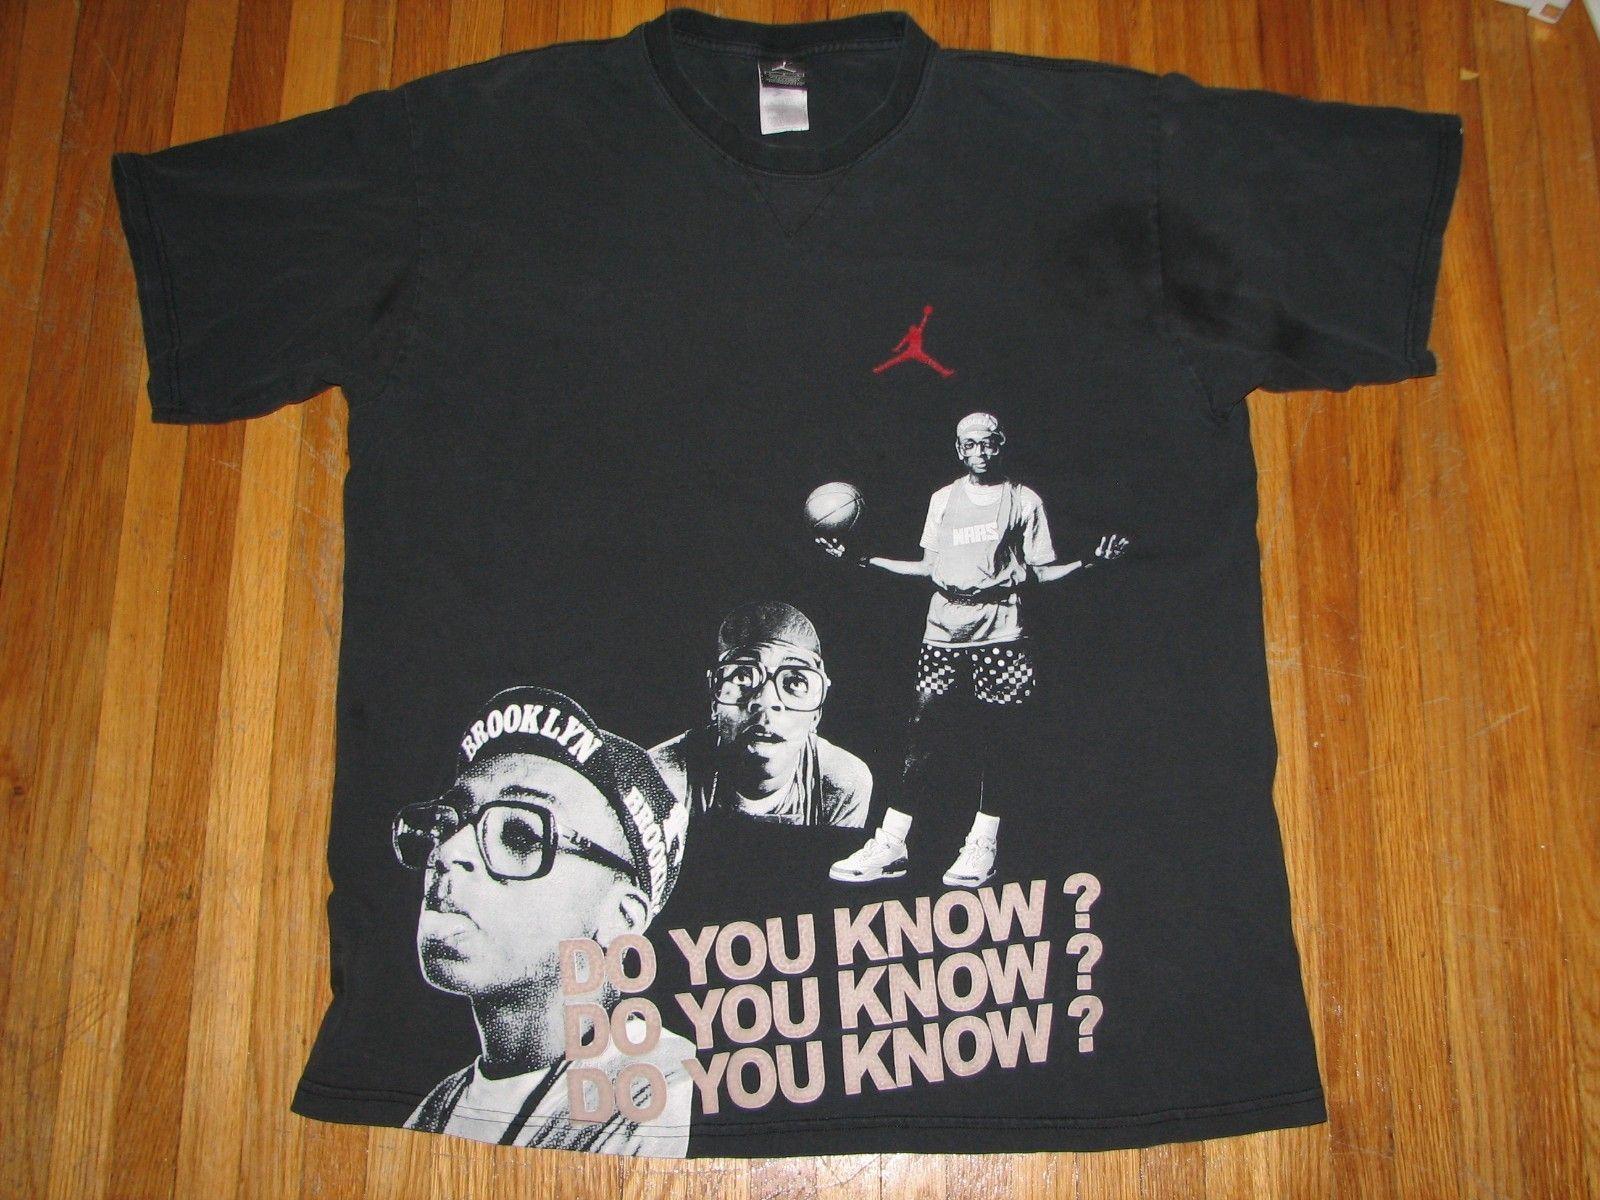 KnowVintage Air Shirt Jordan Lee Spike Michael Do You Basketball iOPuZXkT